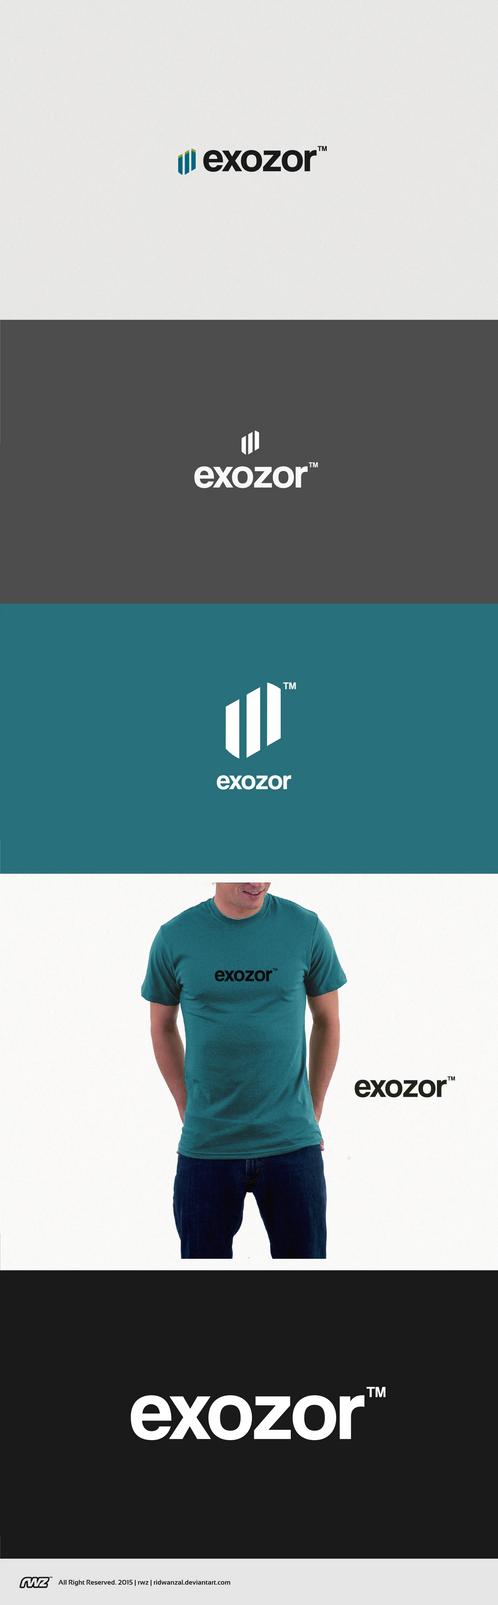 exozor by ridwanzal